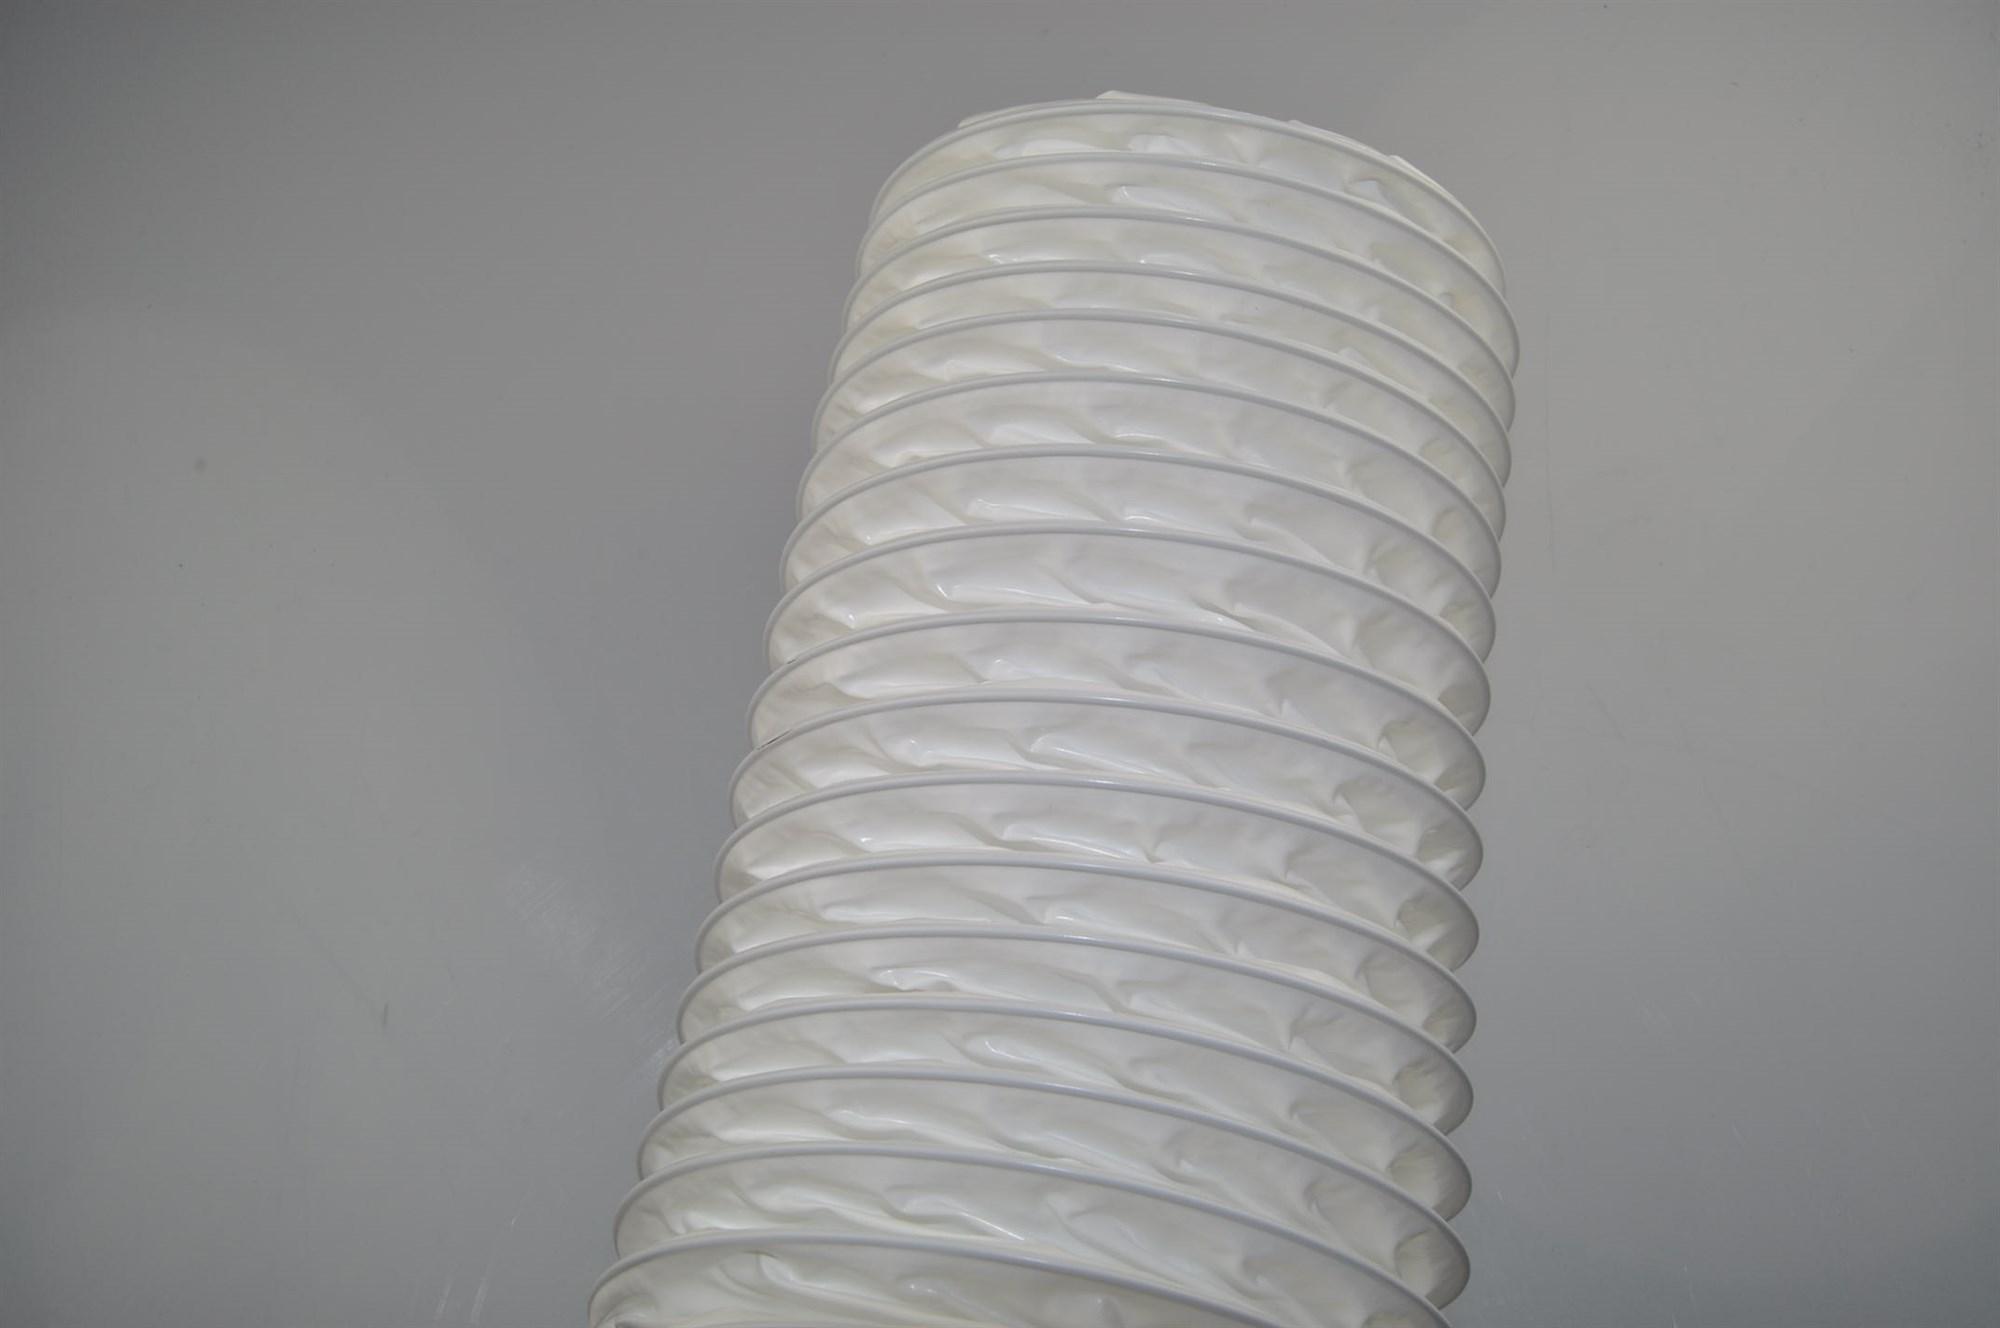 Abluftschlauch universal dunstabzugshaube mm flexibel